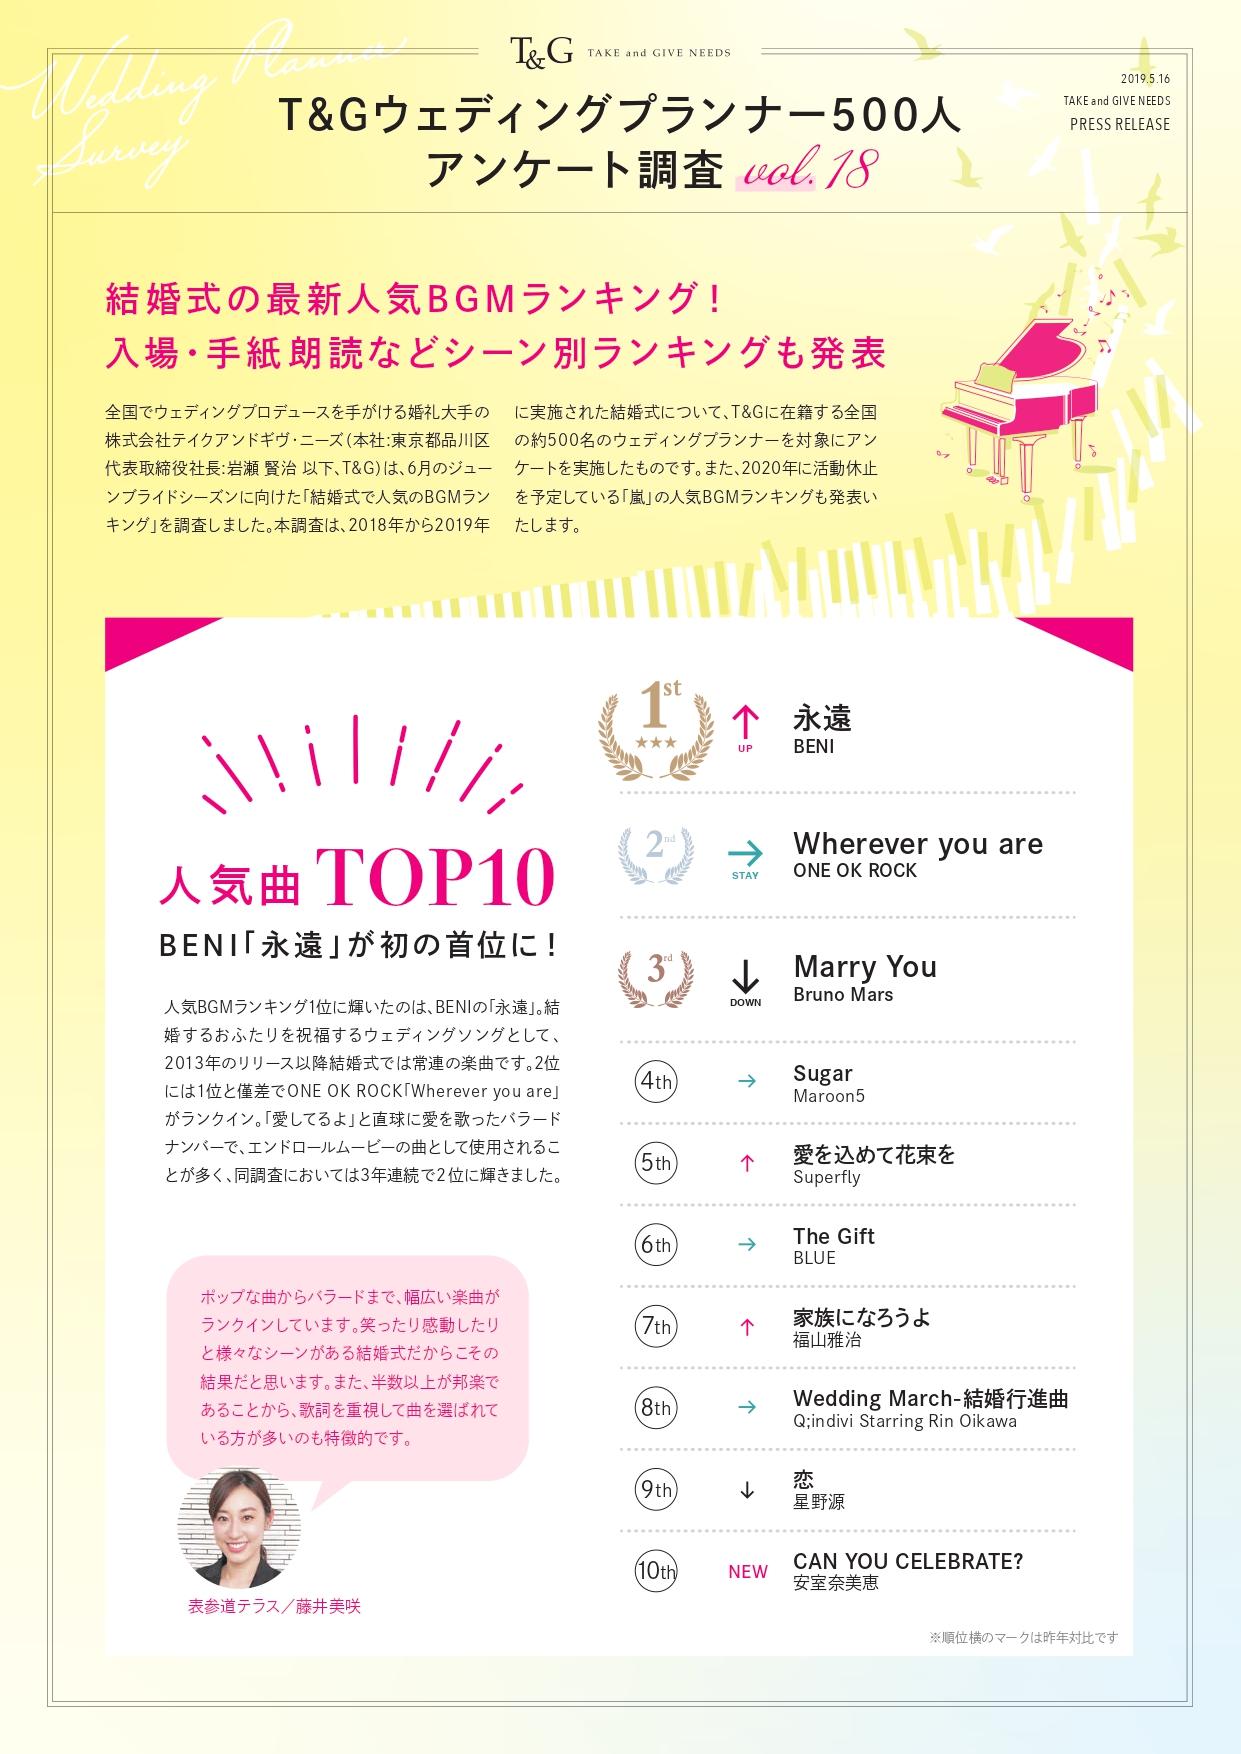 【TOPIX】T&Gウェディングプランナー500人アンケート調査Vol.18『結婚式で人気のBGMランキング』を発表